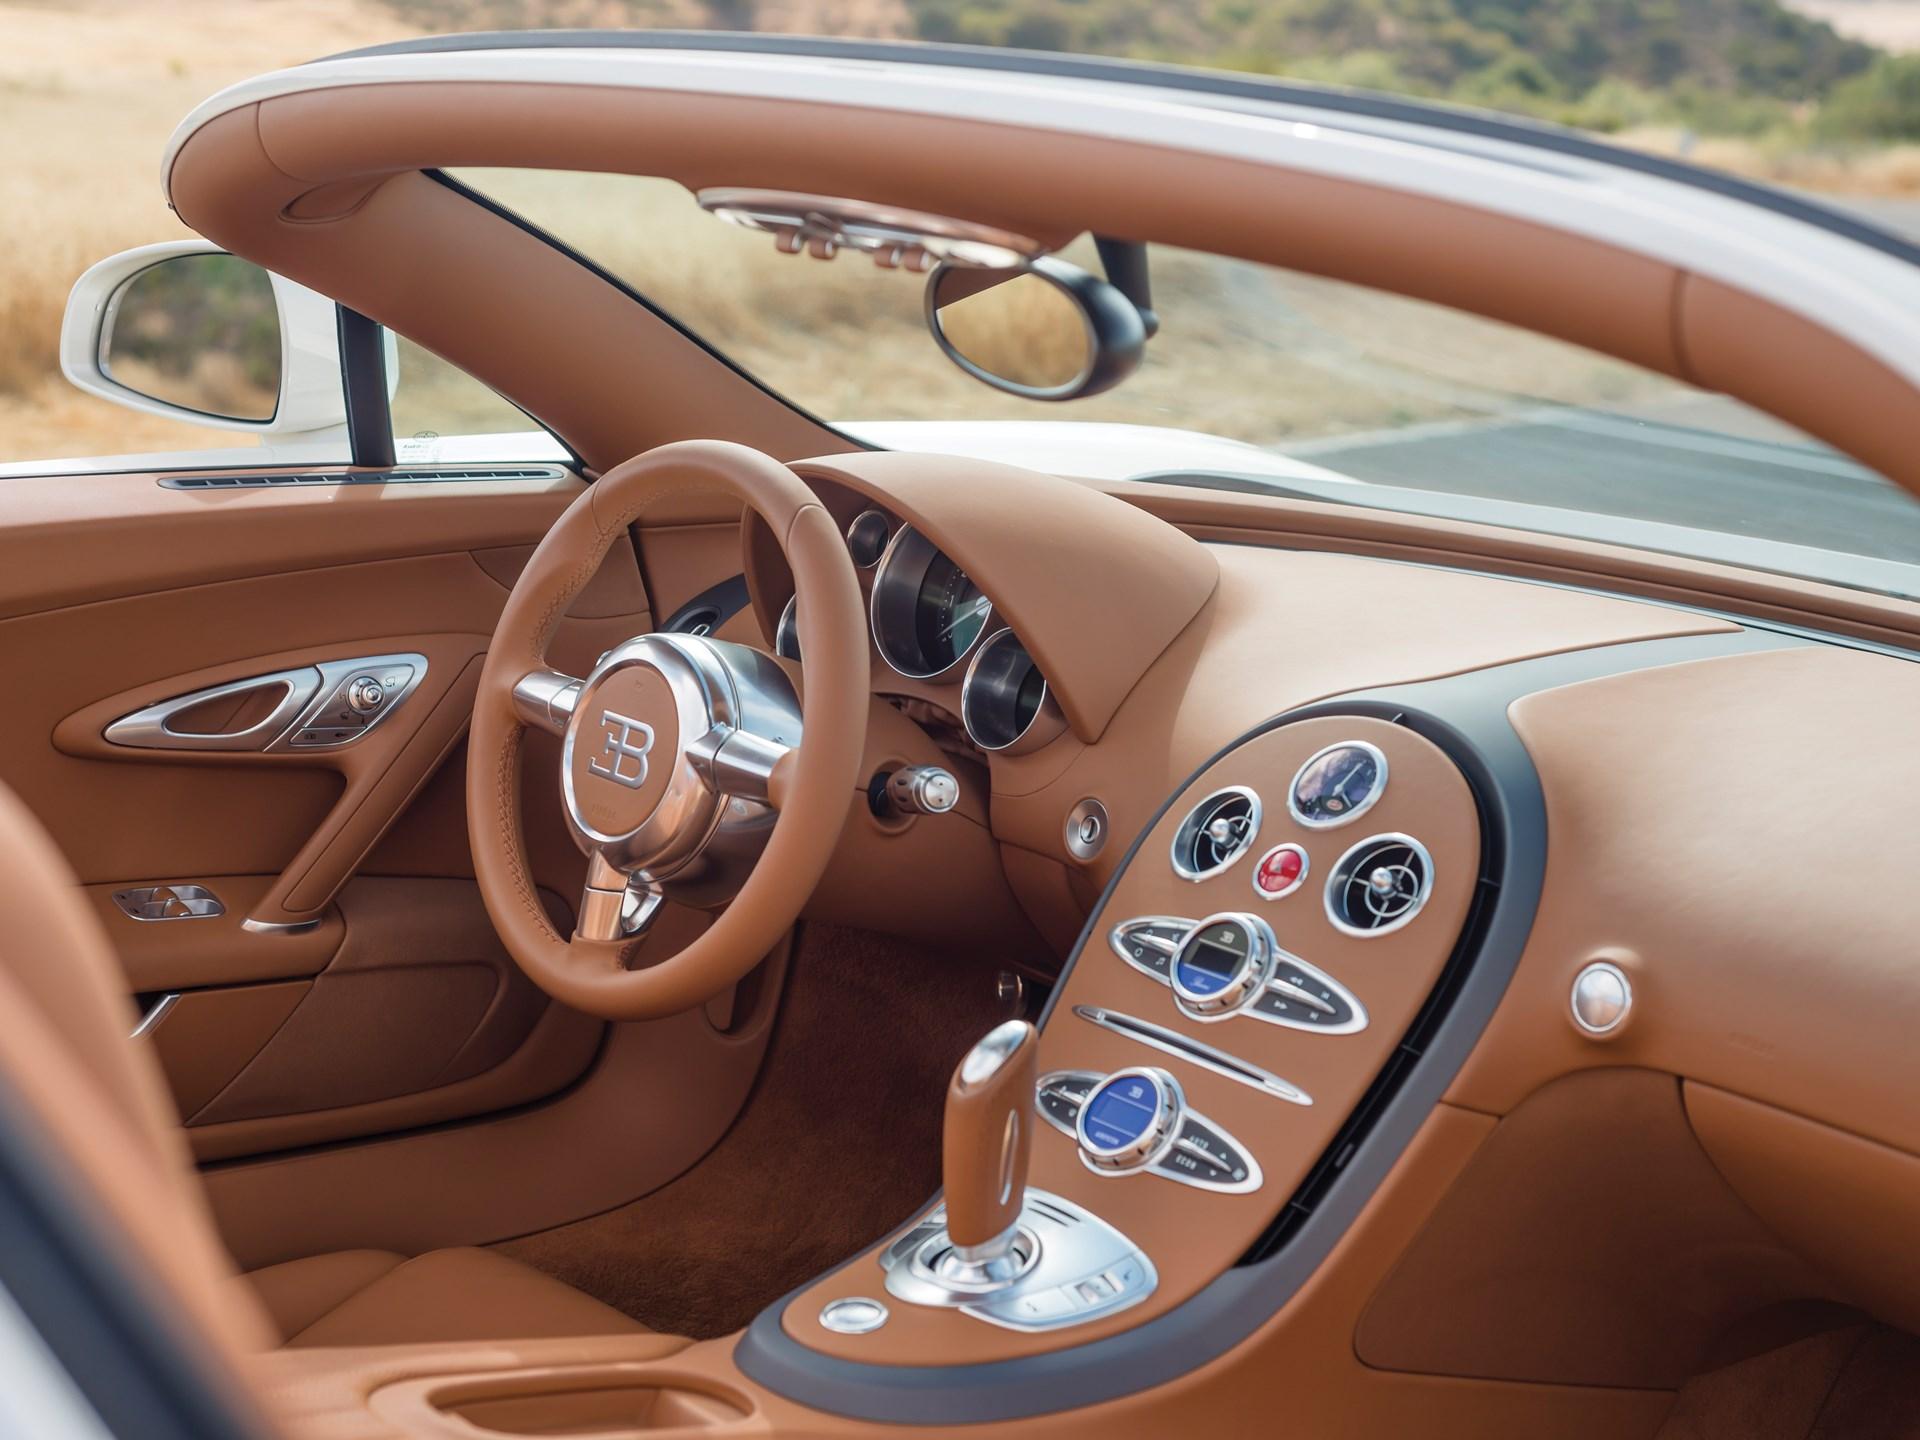 2012 Bugatti Veyron 16.4 Grand Sport